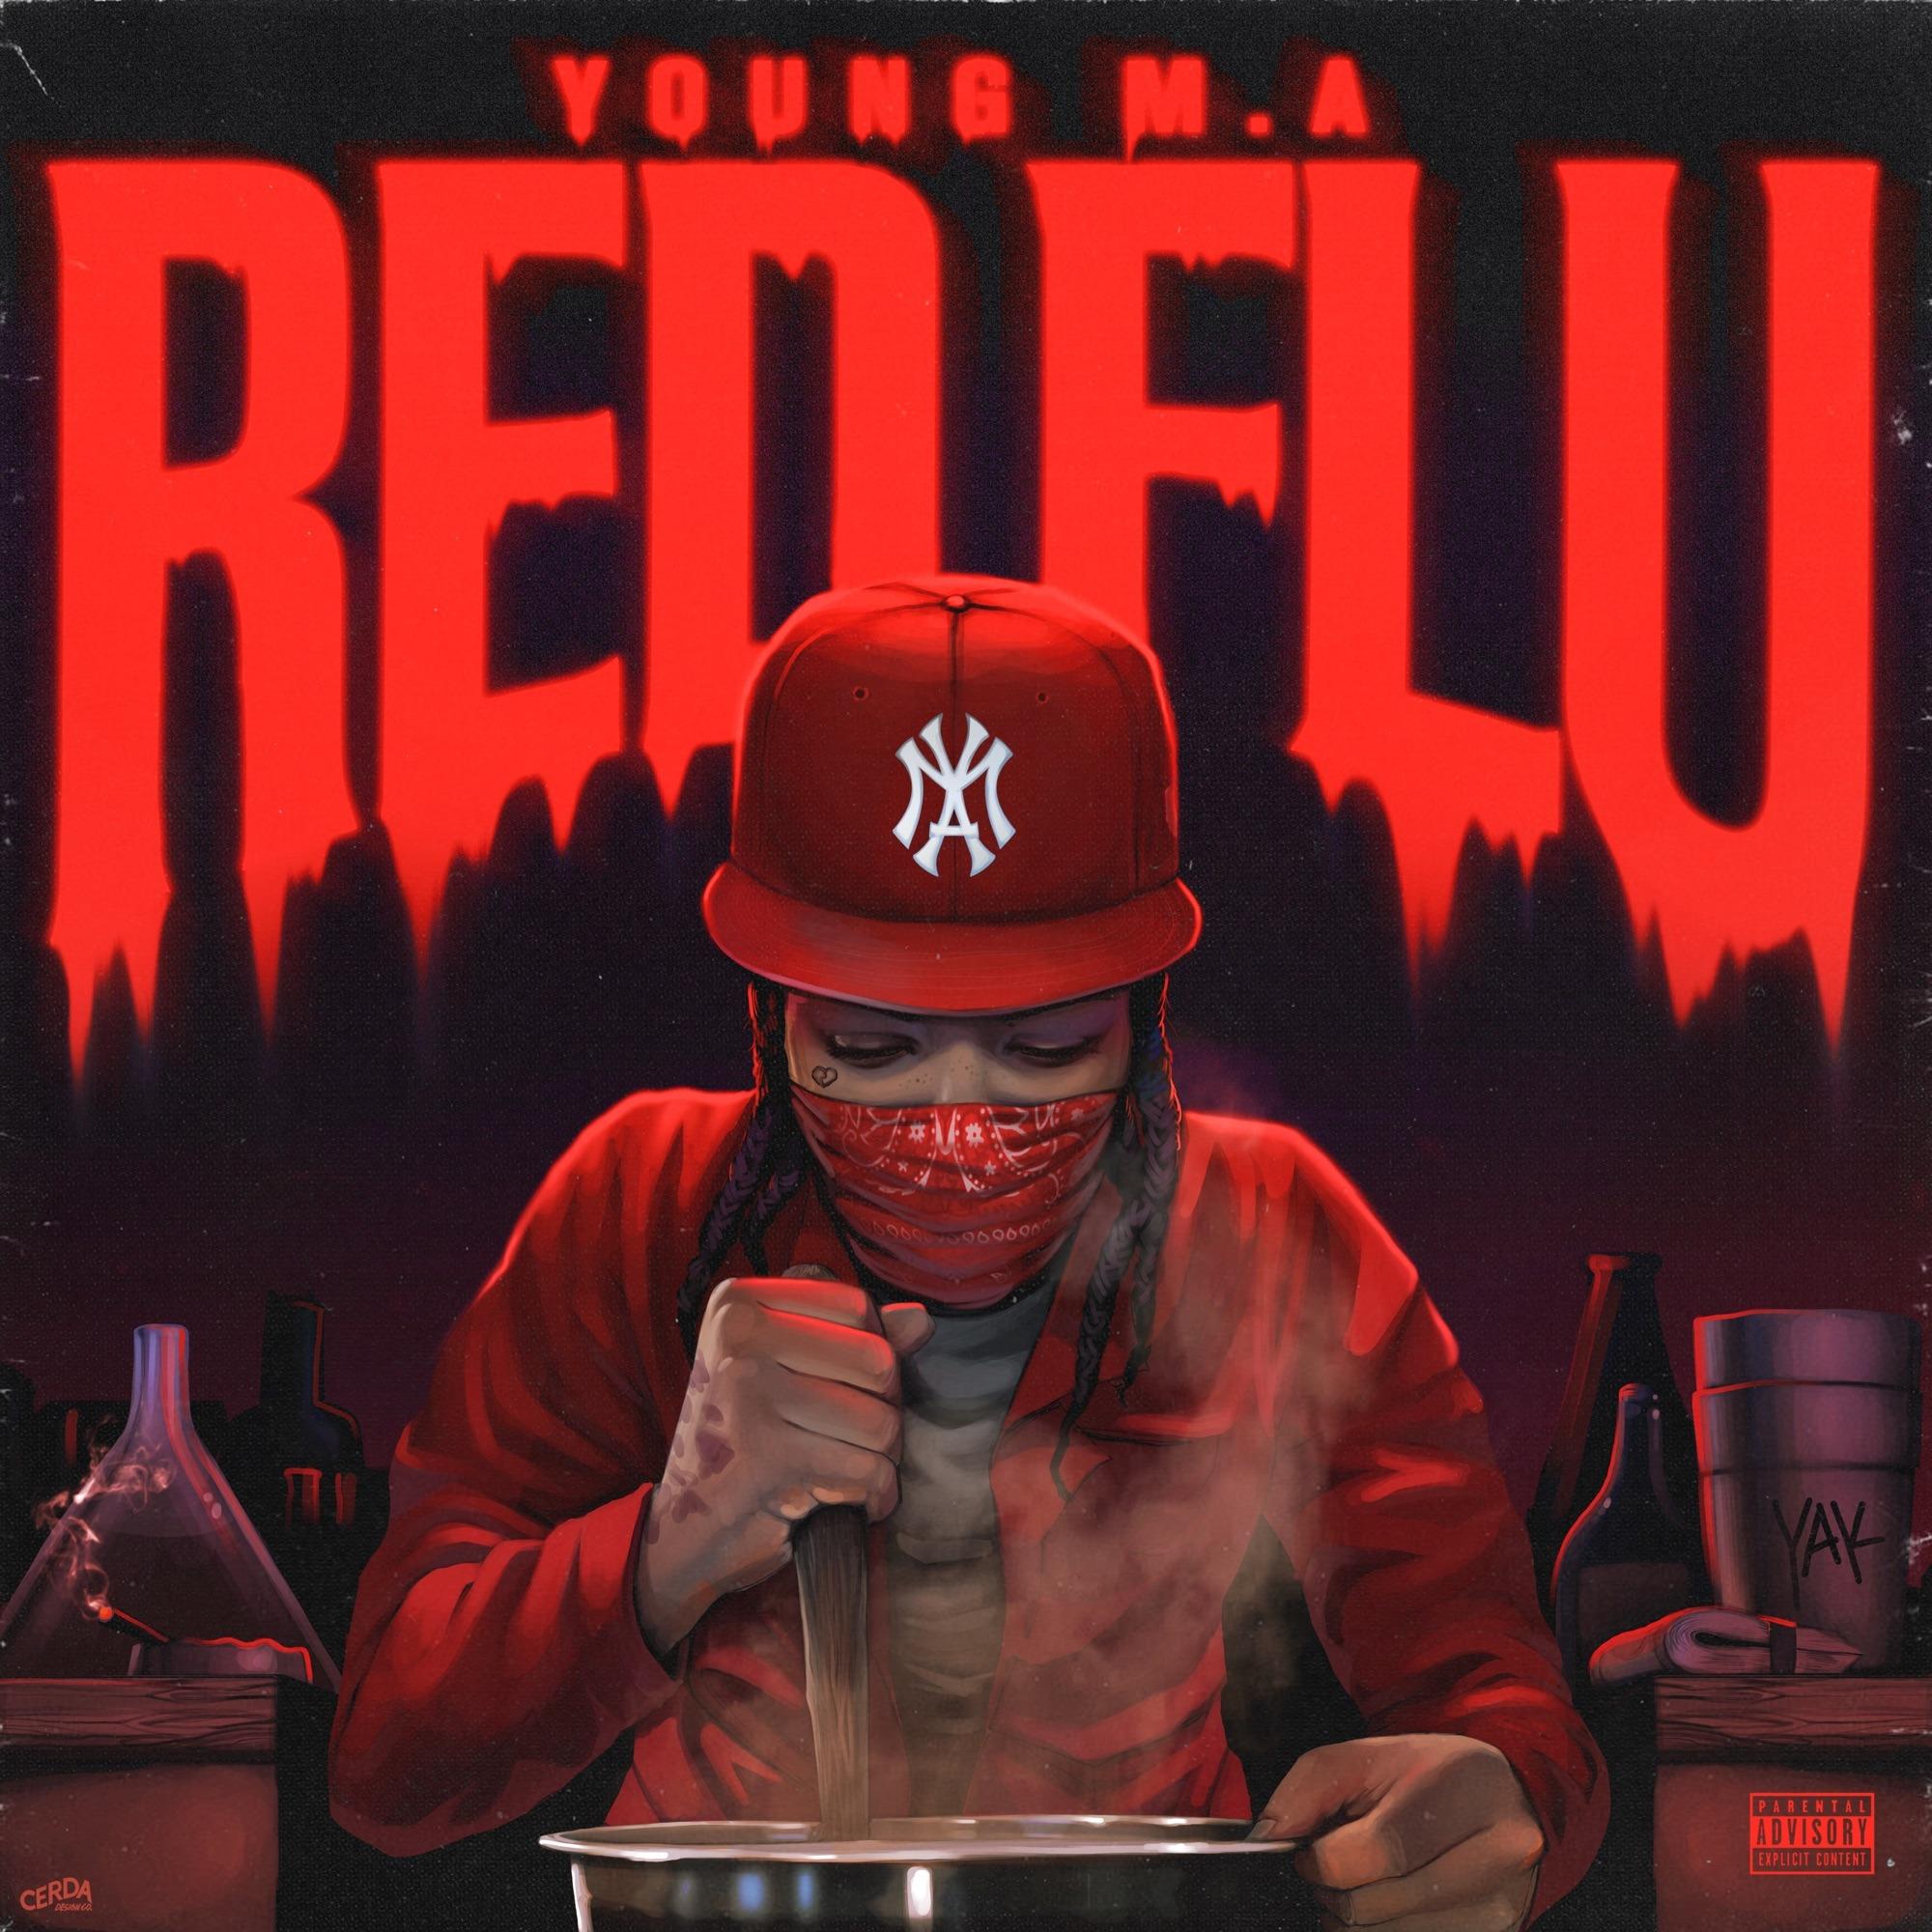 Young M.A – Bad B*tch Anthem